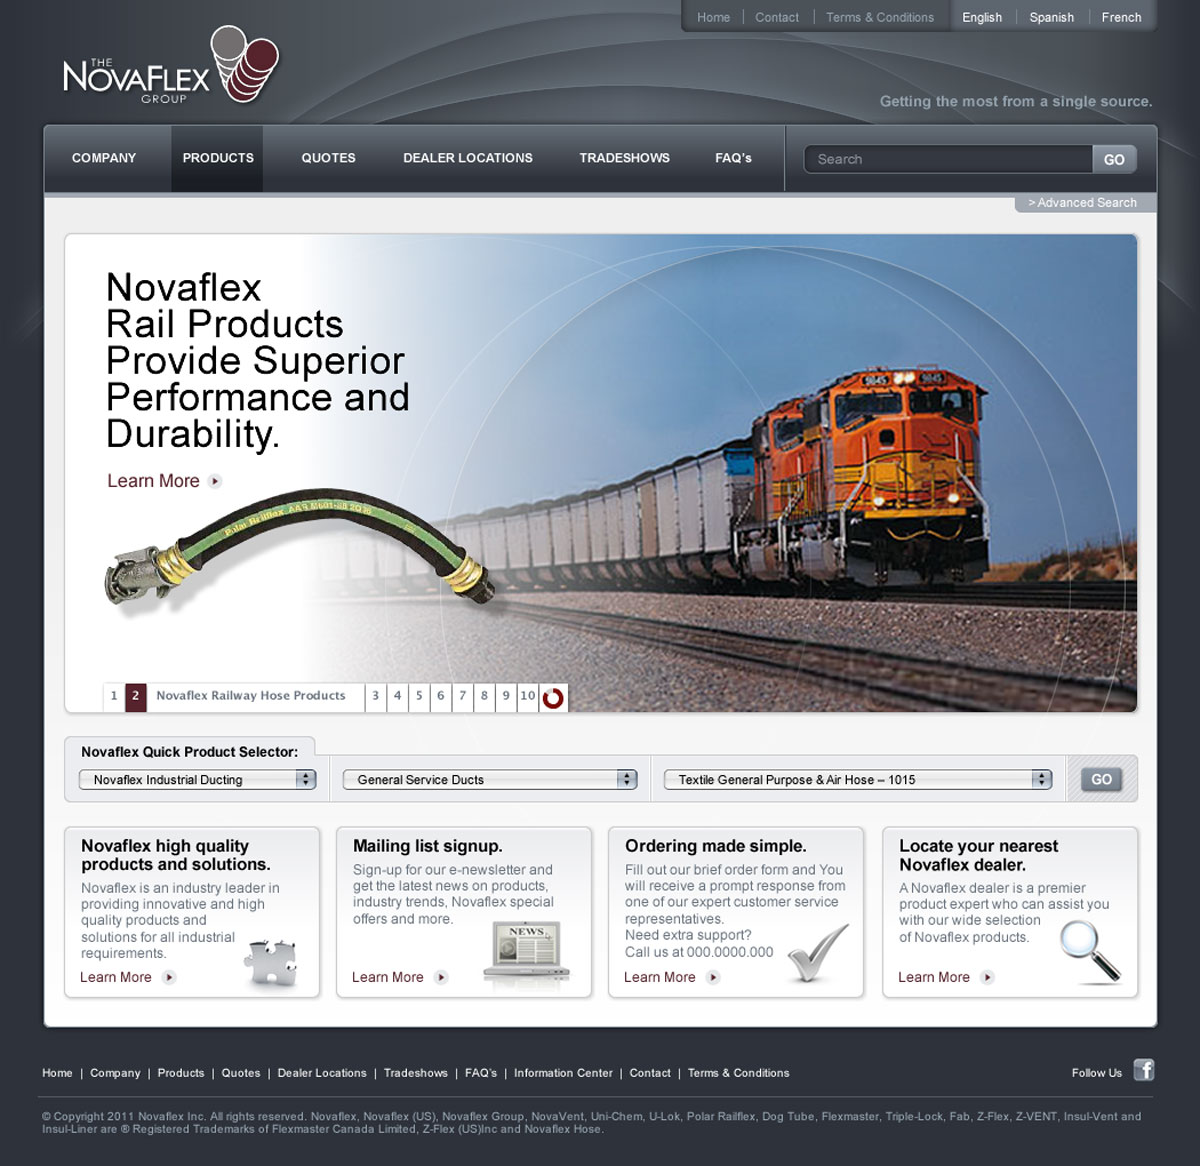 NovaFlex website